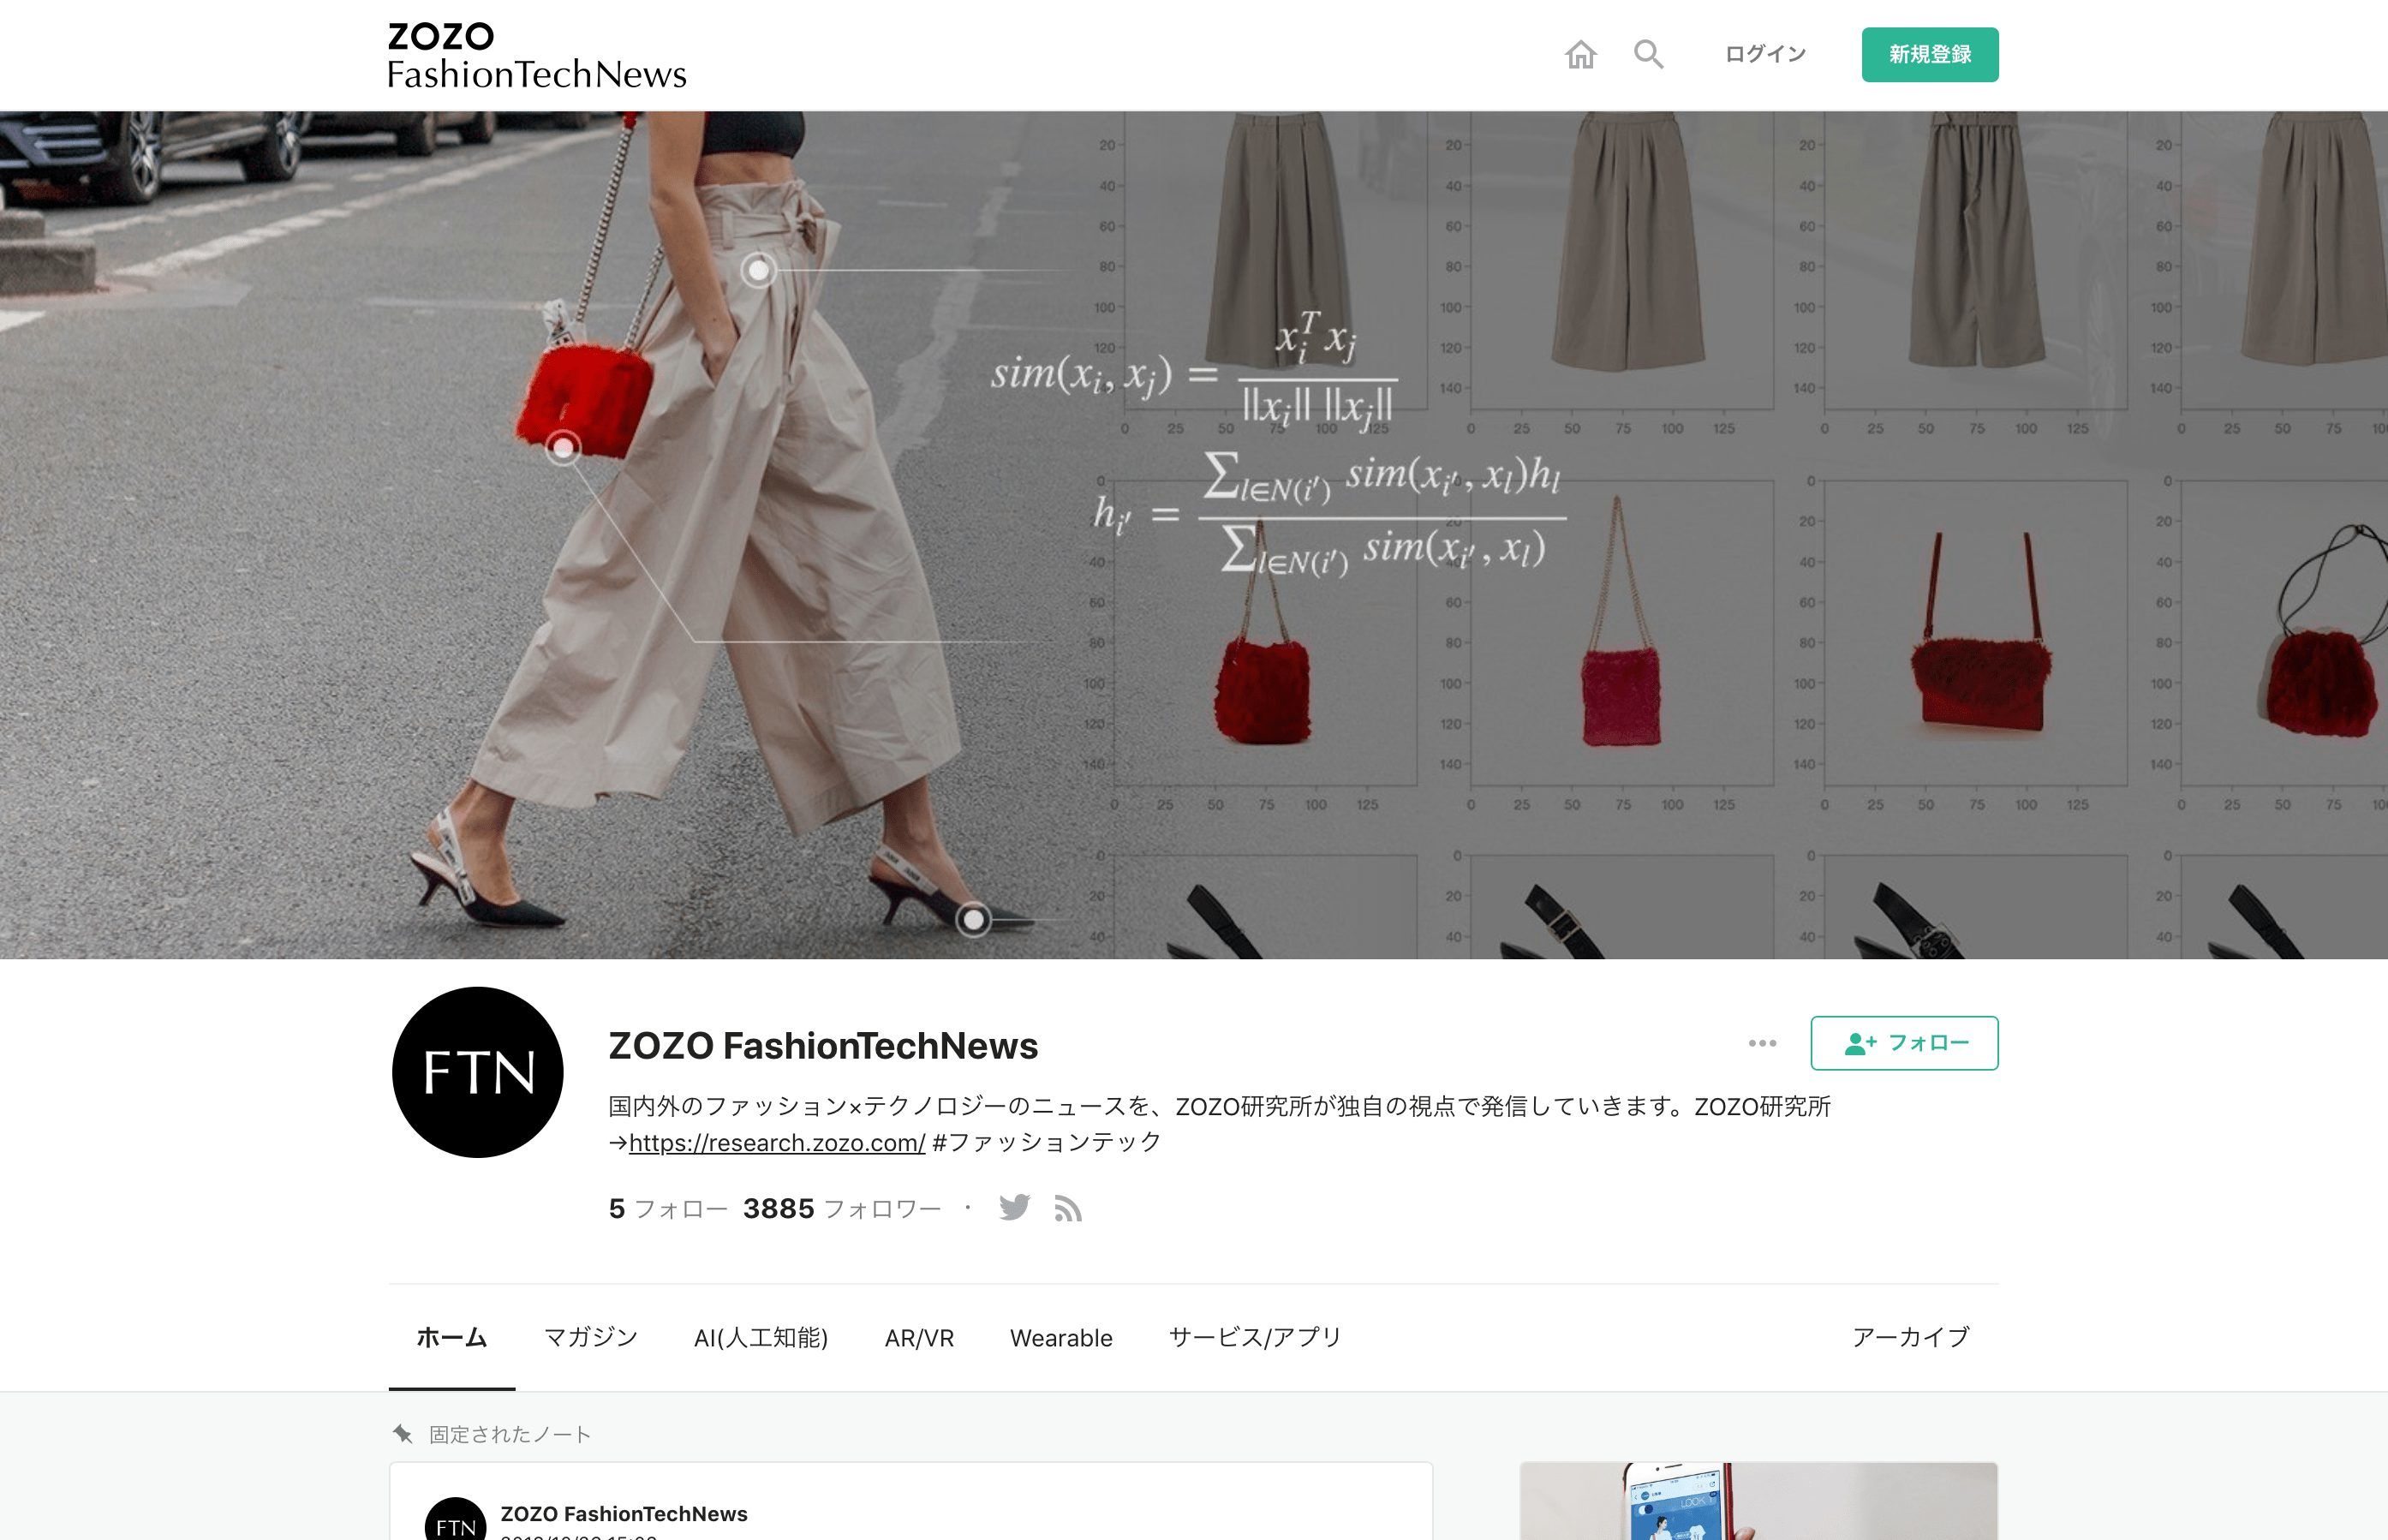 ZOZO FashionTechNews